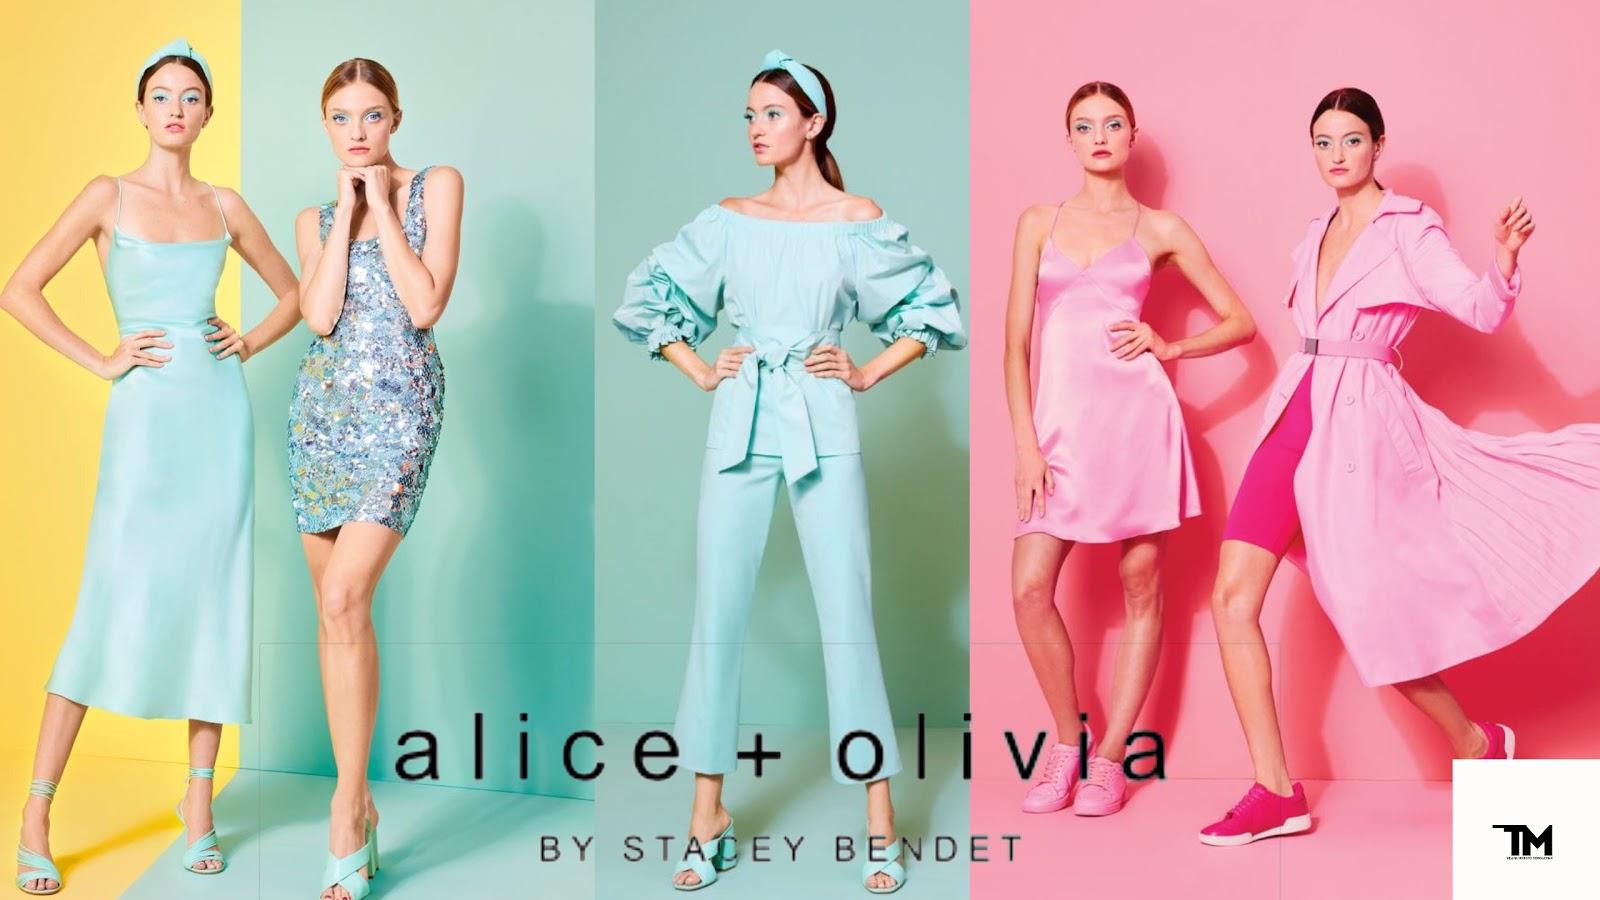 Нарушительница дресс-кода: бунтарка Стейси Бендет и бренд Alice+Olivia